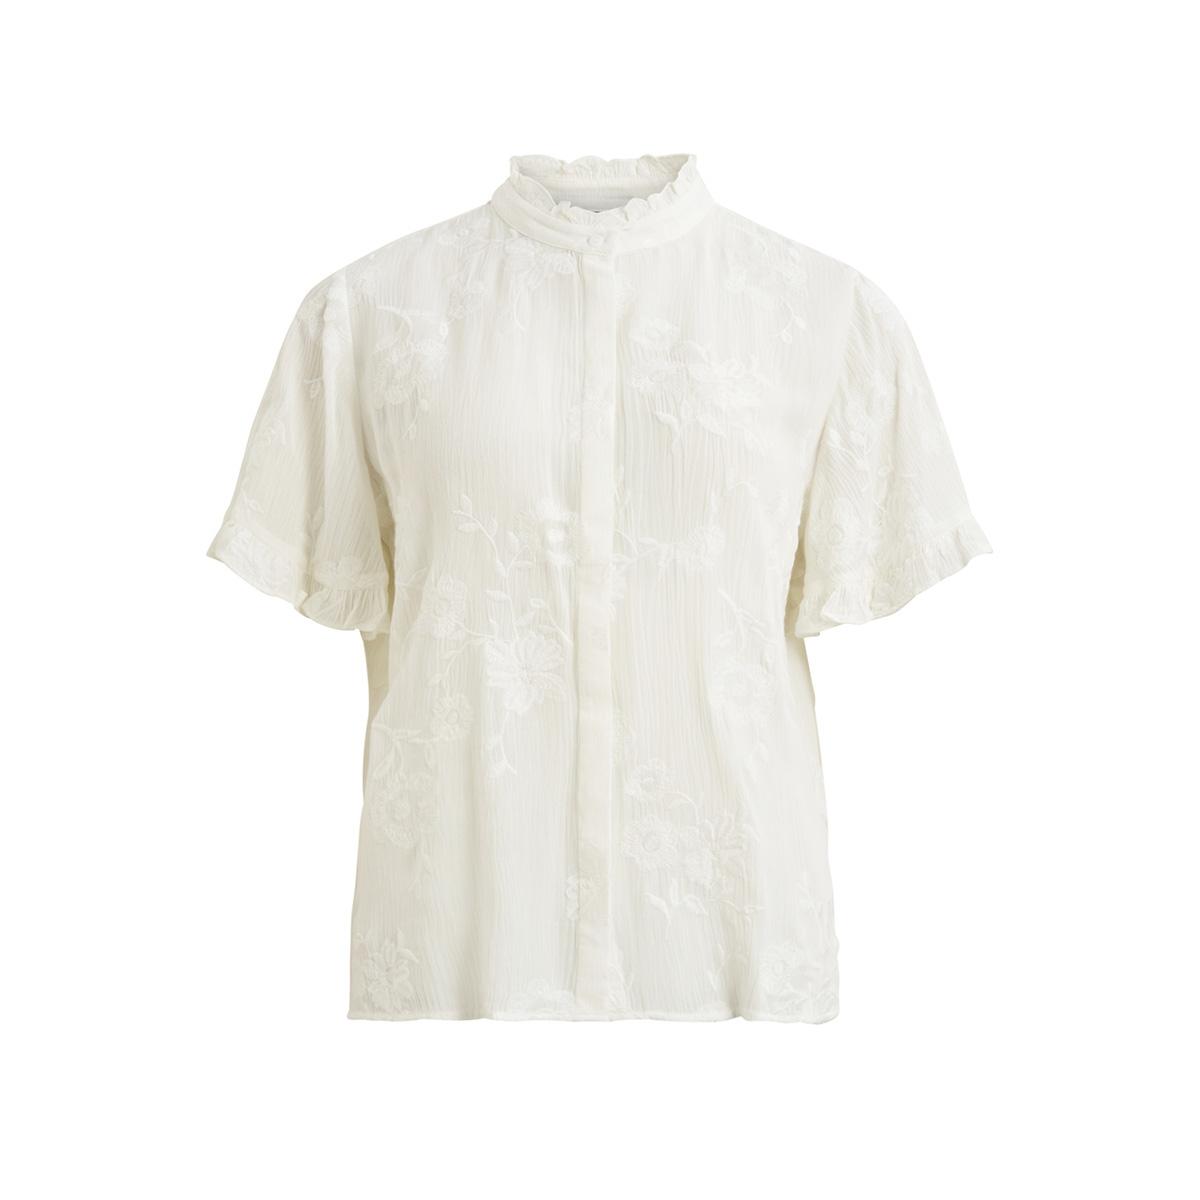 objfoila s/s shirt asp 23030625 object blouse gardenia